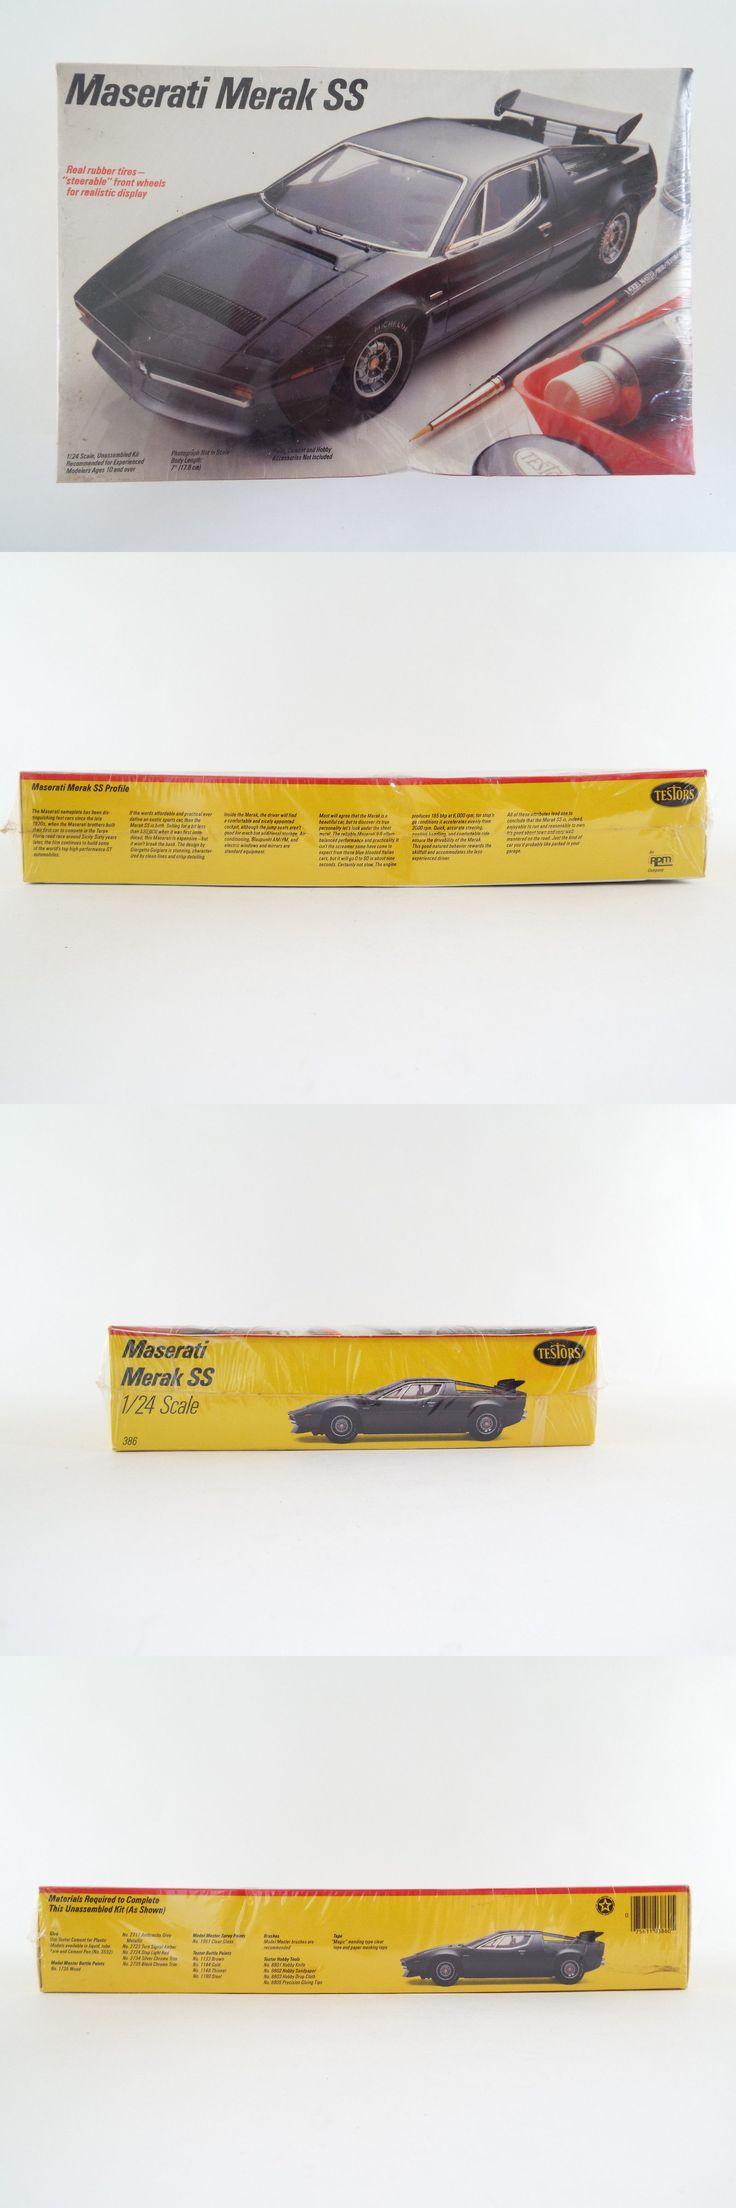 1 24 Scale 145974: Maserati Merak Ss 1:24 Testors Model Kit New And Sealed -> BUY IT NOW ONLY: $74.99 on eBay!